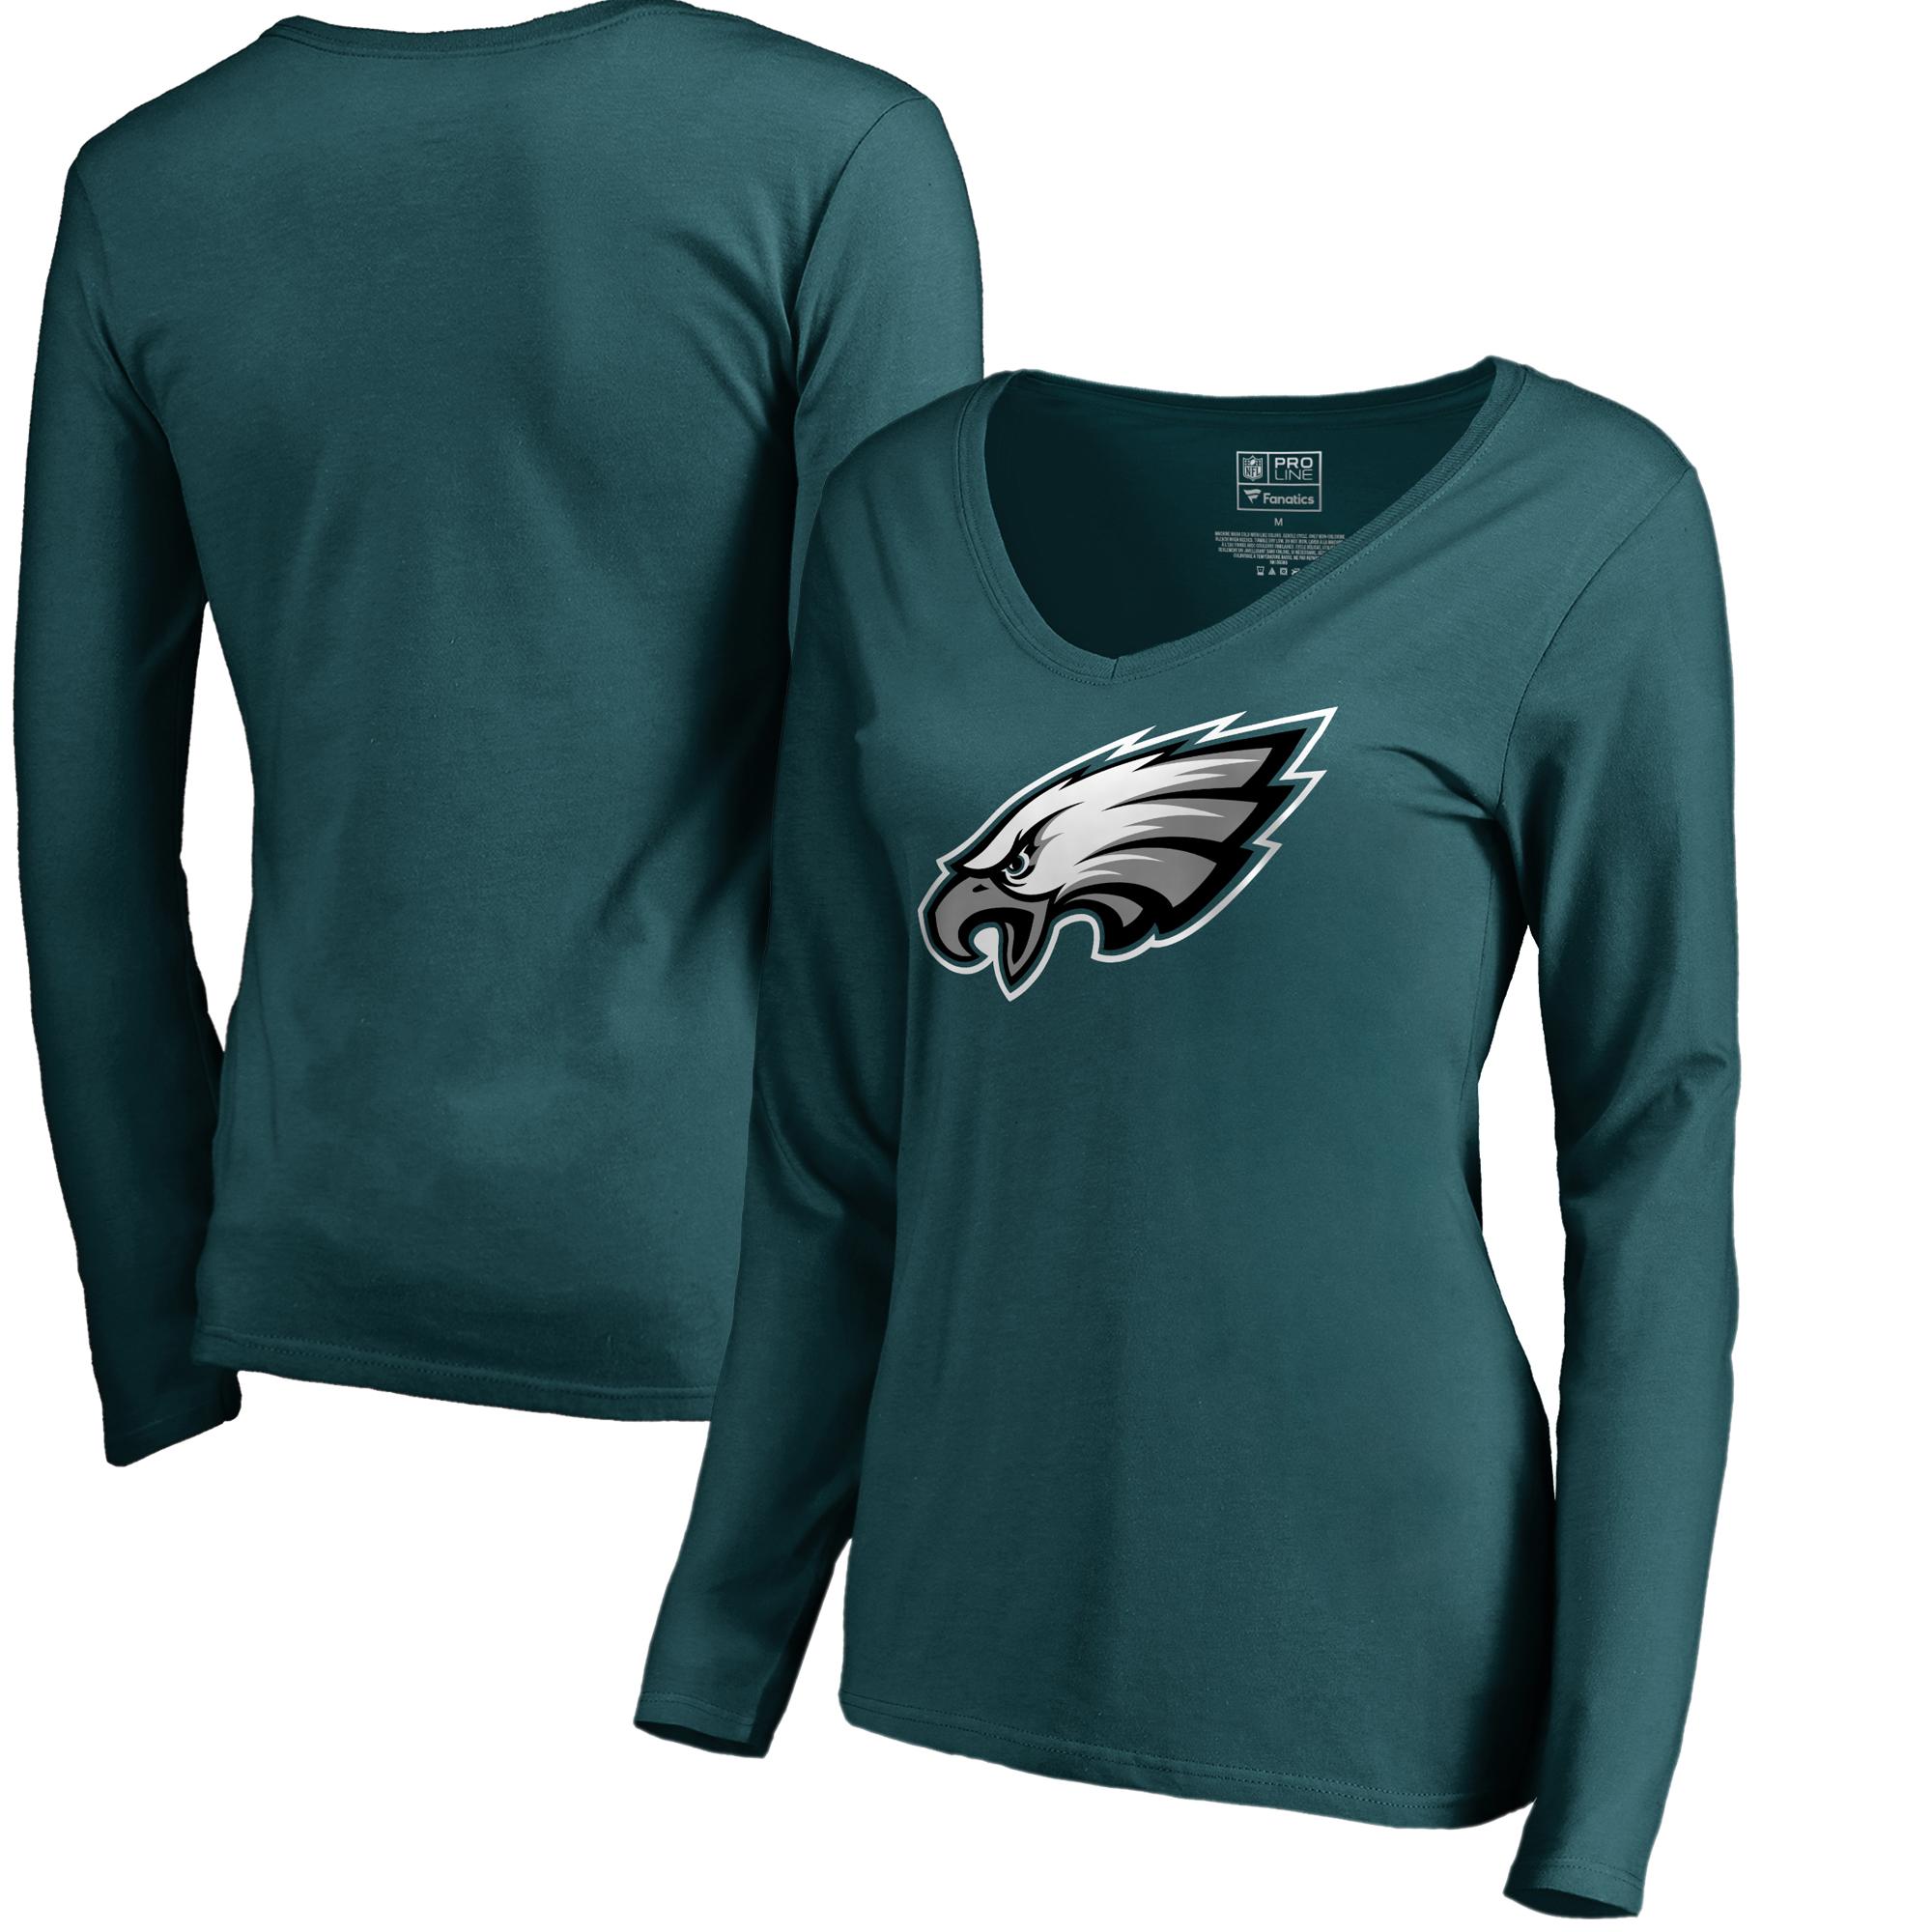 Philadelphia Eagles NFL Pro Line by Fanatics Branded Women's Primary Logo II V-Neck Long Sleeve T-Shirt - Midnight Green